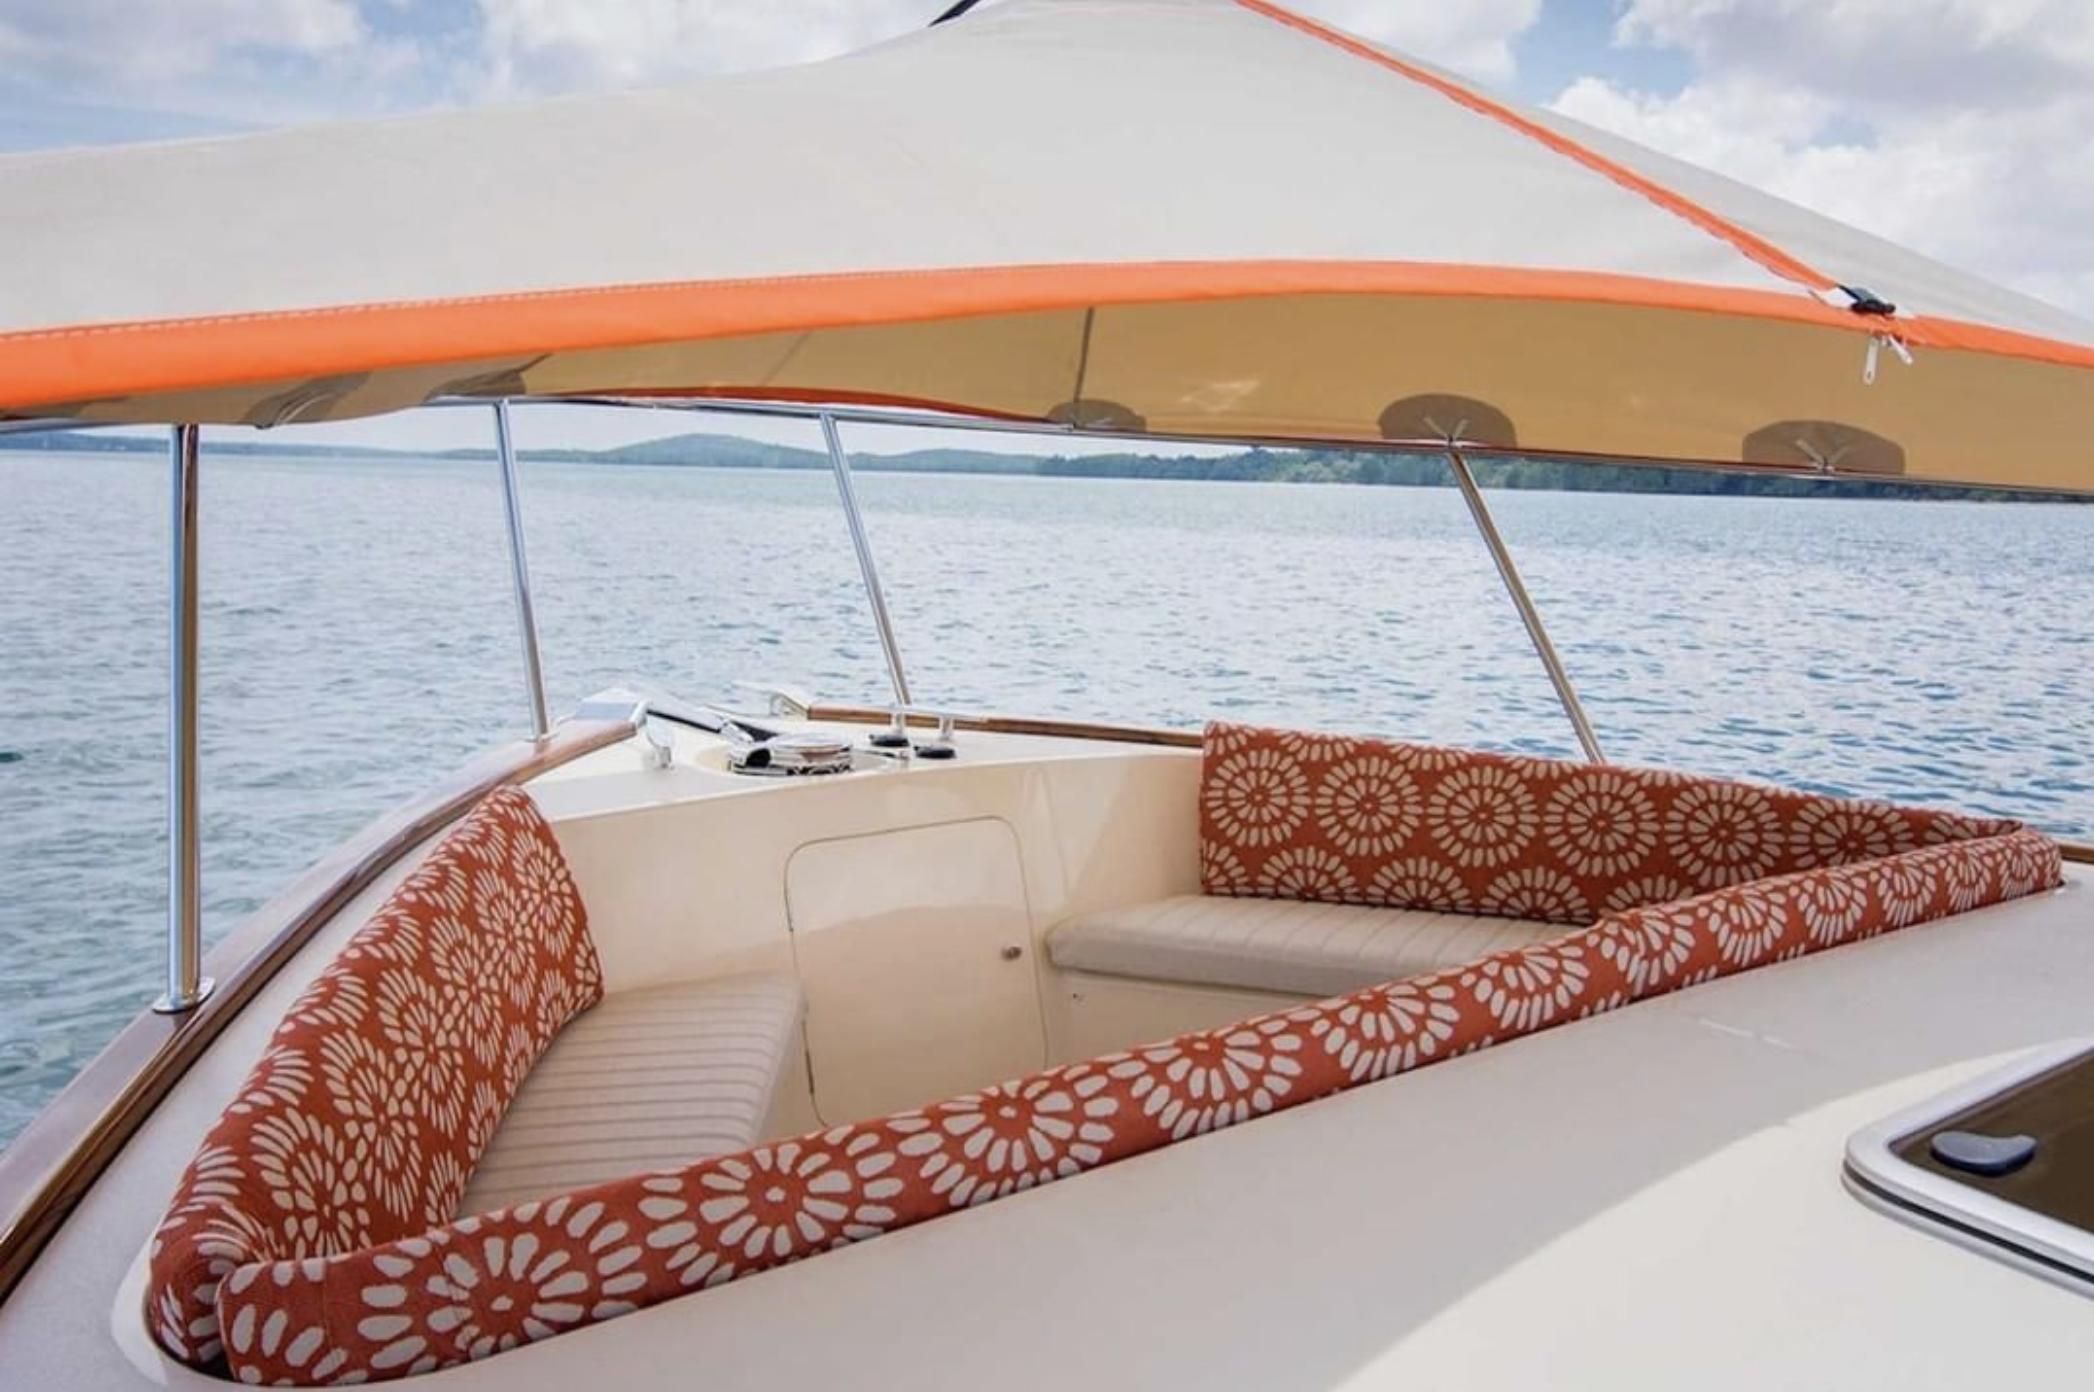 Pb65 In 2020 Palm Beach Motor Yacht Yacht